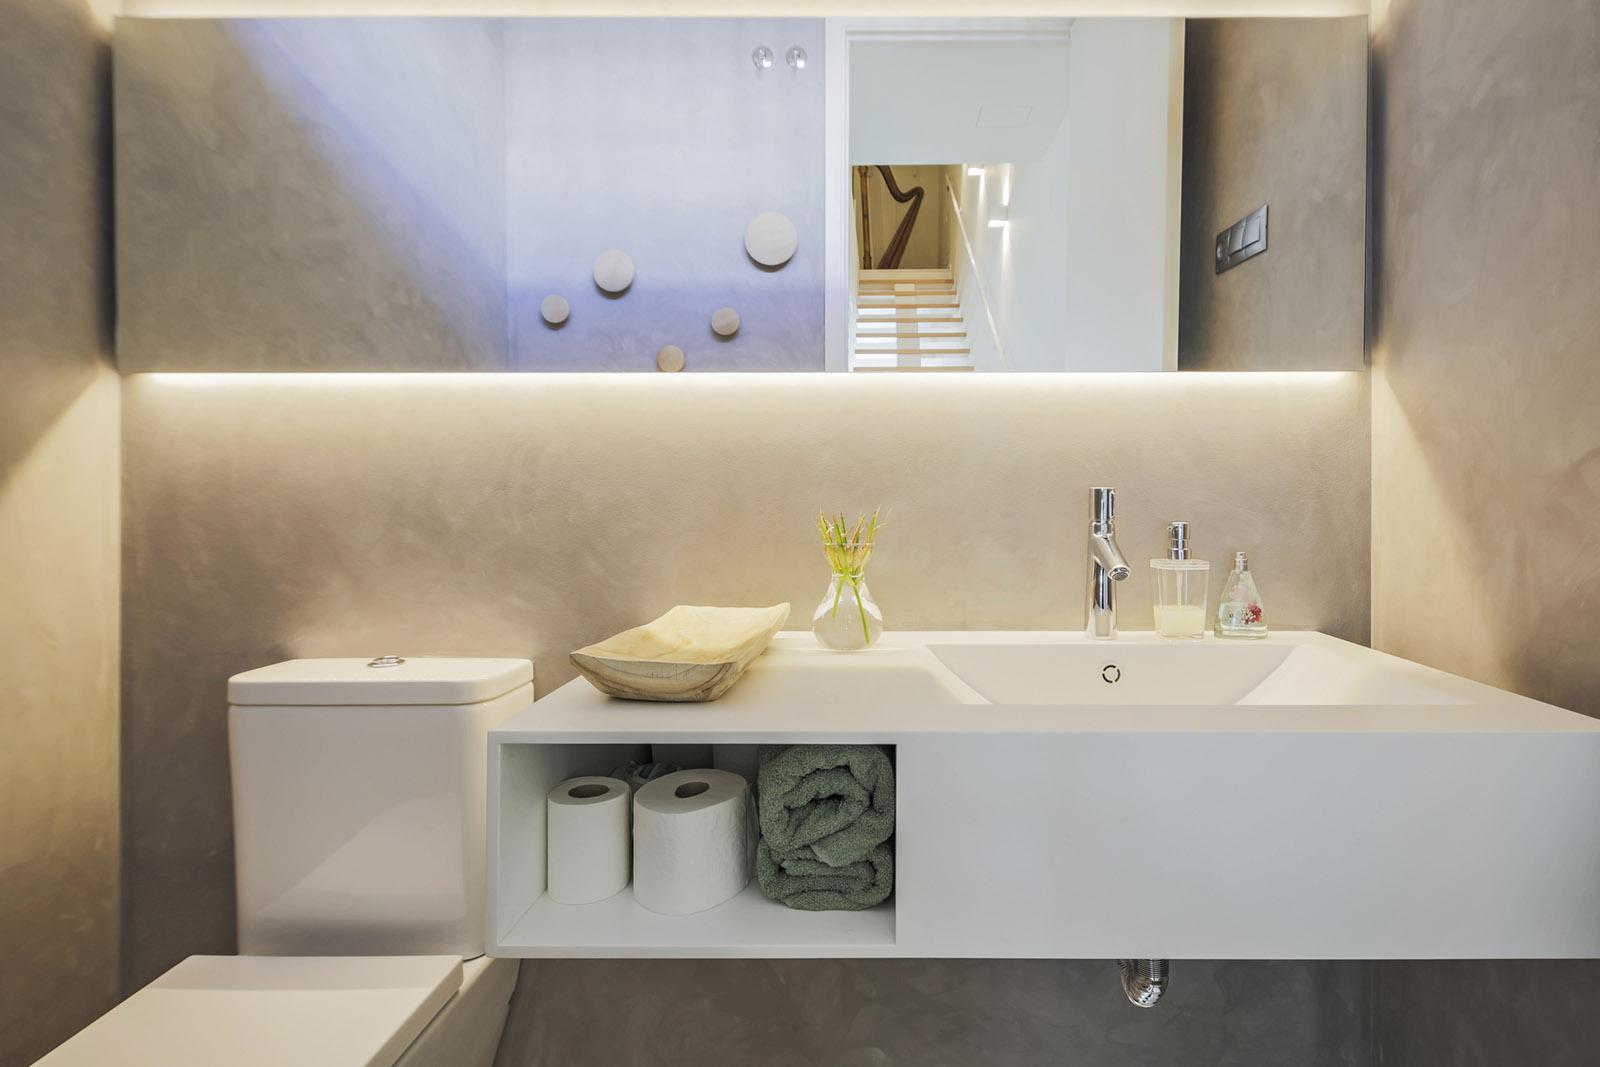 Architectural698-Interior-photographer-Madrid-Spain-.jpg